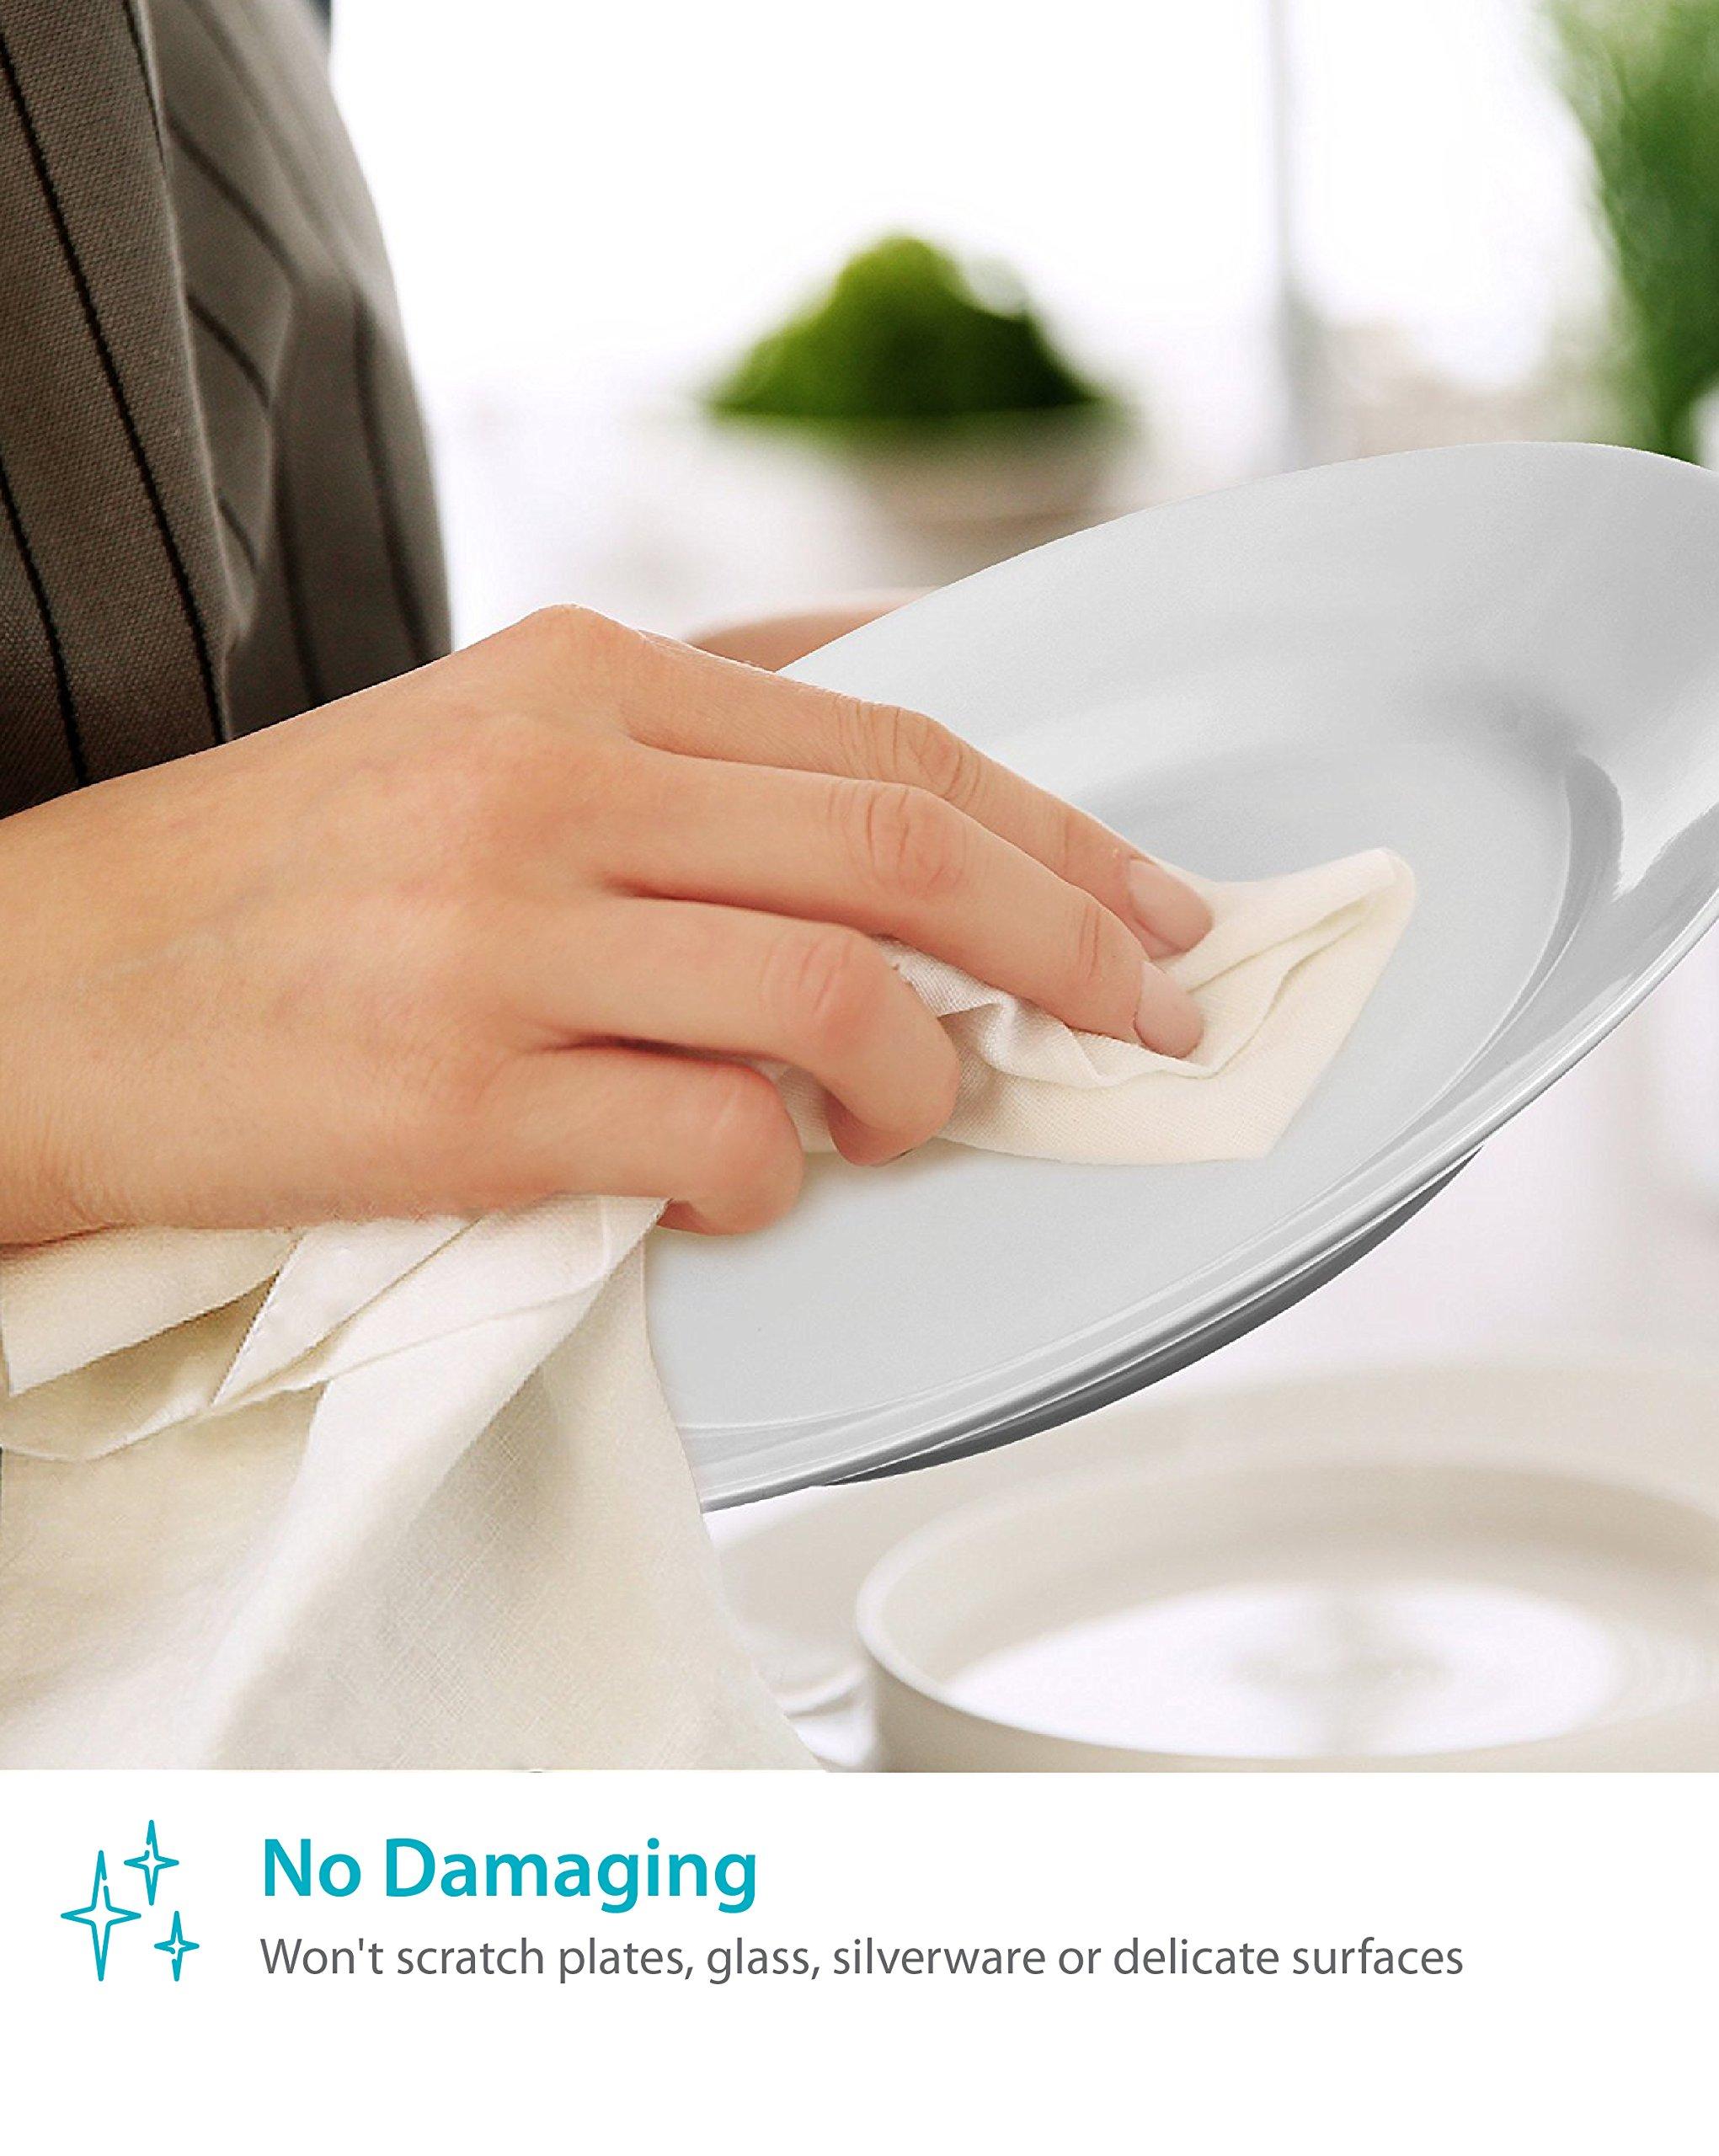 Zeppoli 12-Pack Flour Sack Towels - 31'' x 31'' Kitchen Towels - Absorbent White Dish Towels - 100% Ring Spun Cotton Bar Towels by Zeppoli (Image #4)